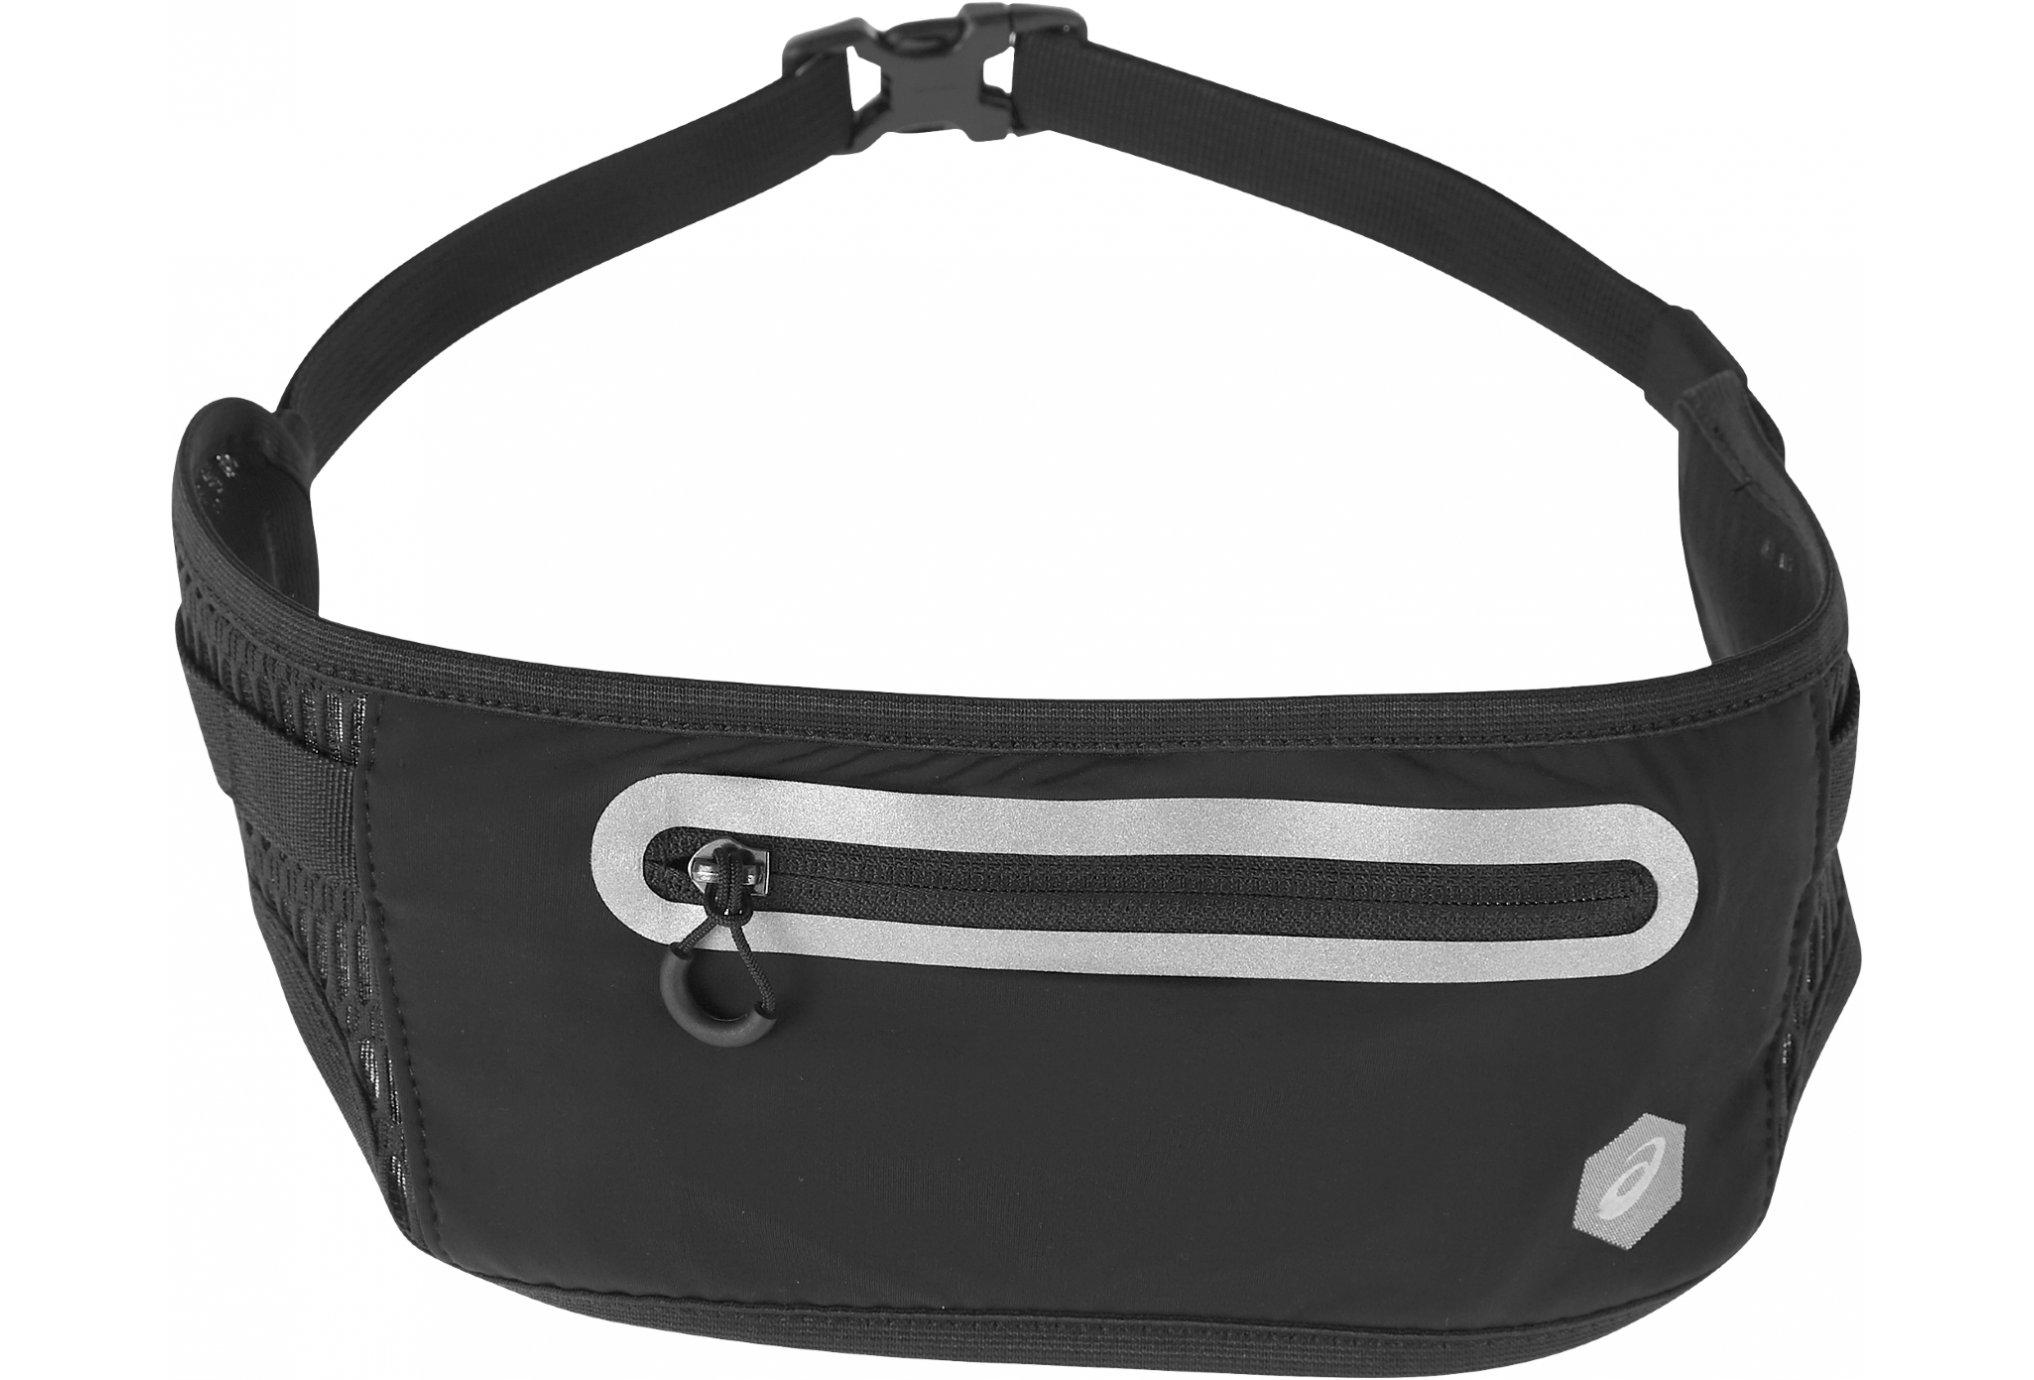 Asics Waist pouch - l ceinture / porte dossard